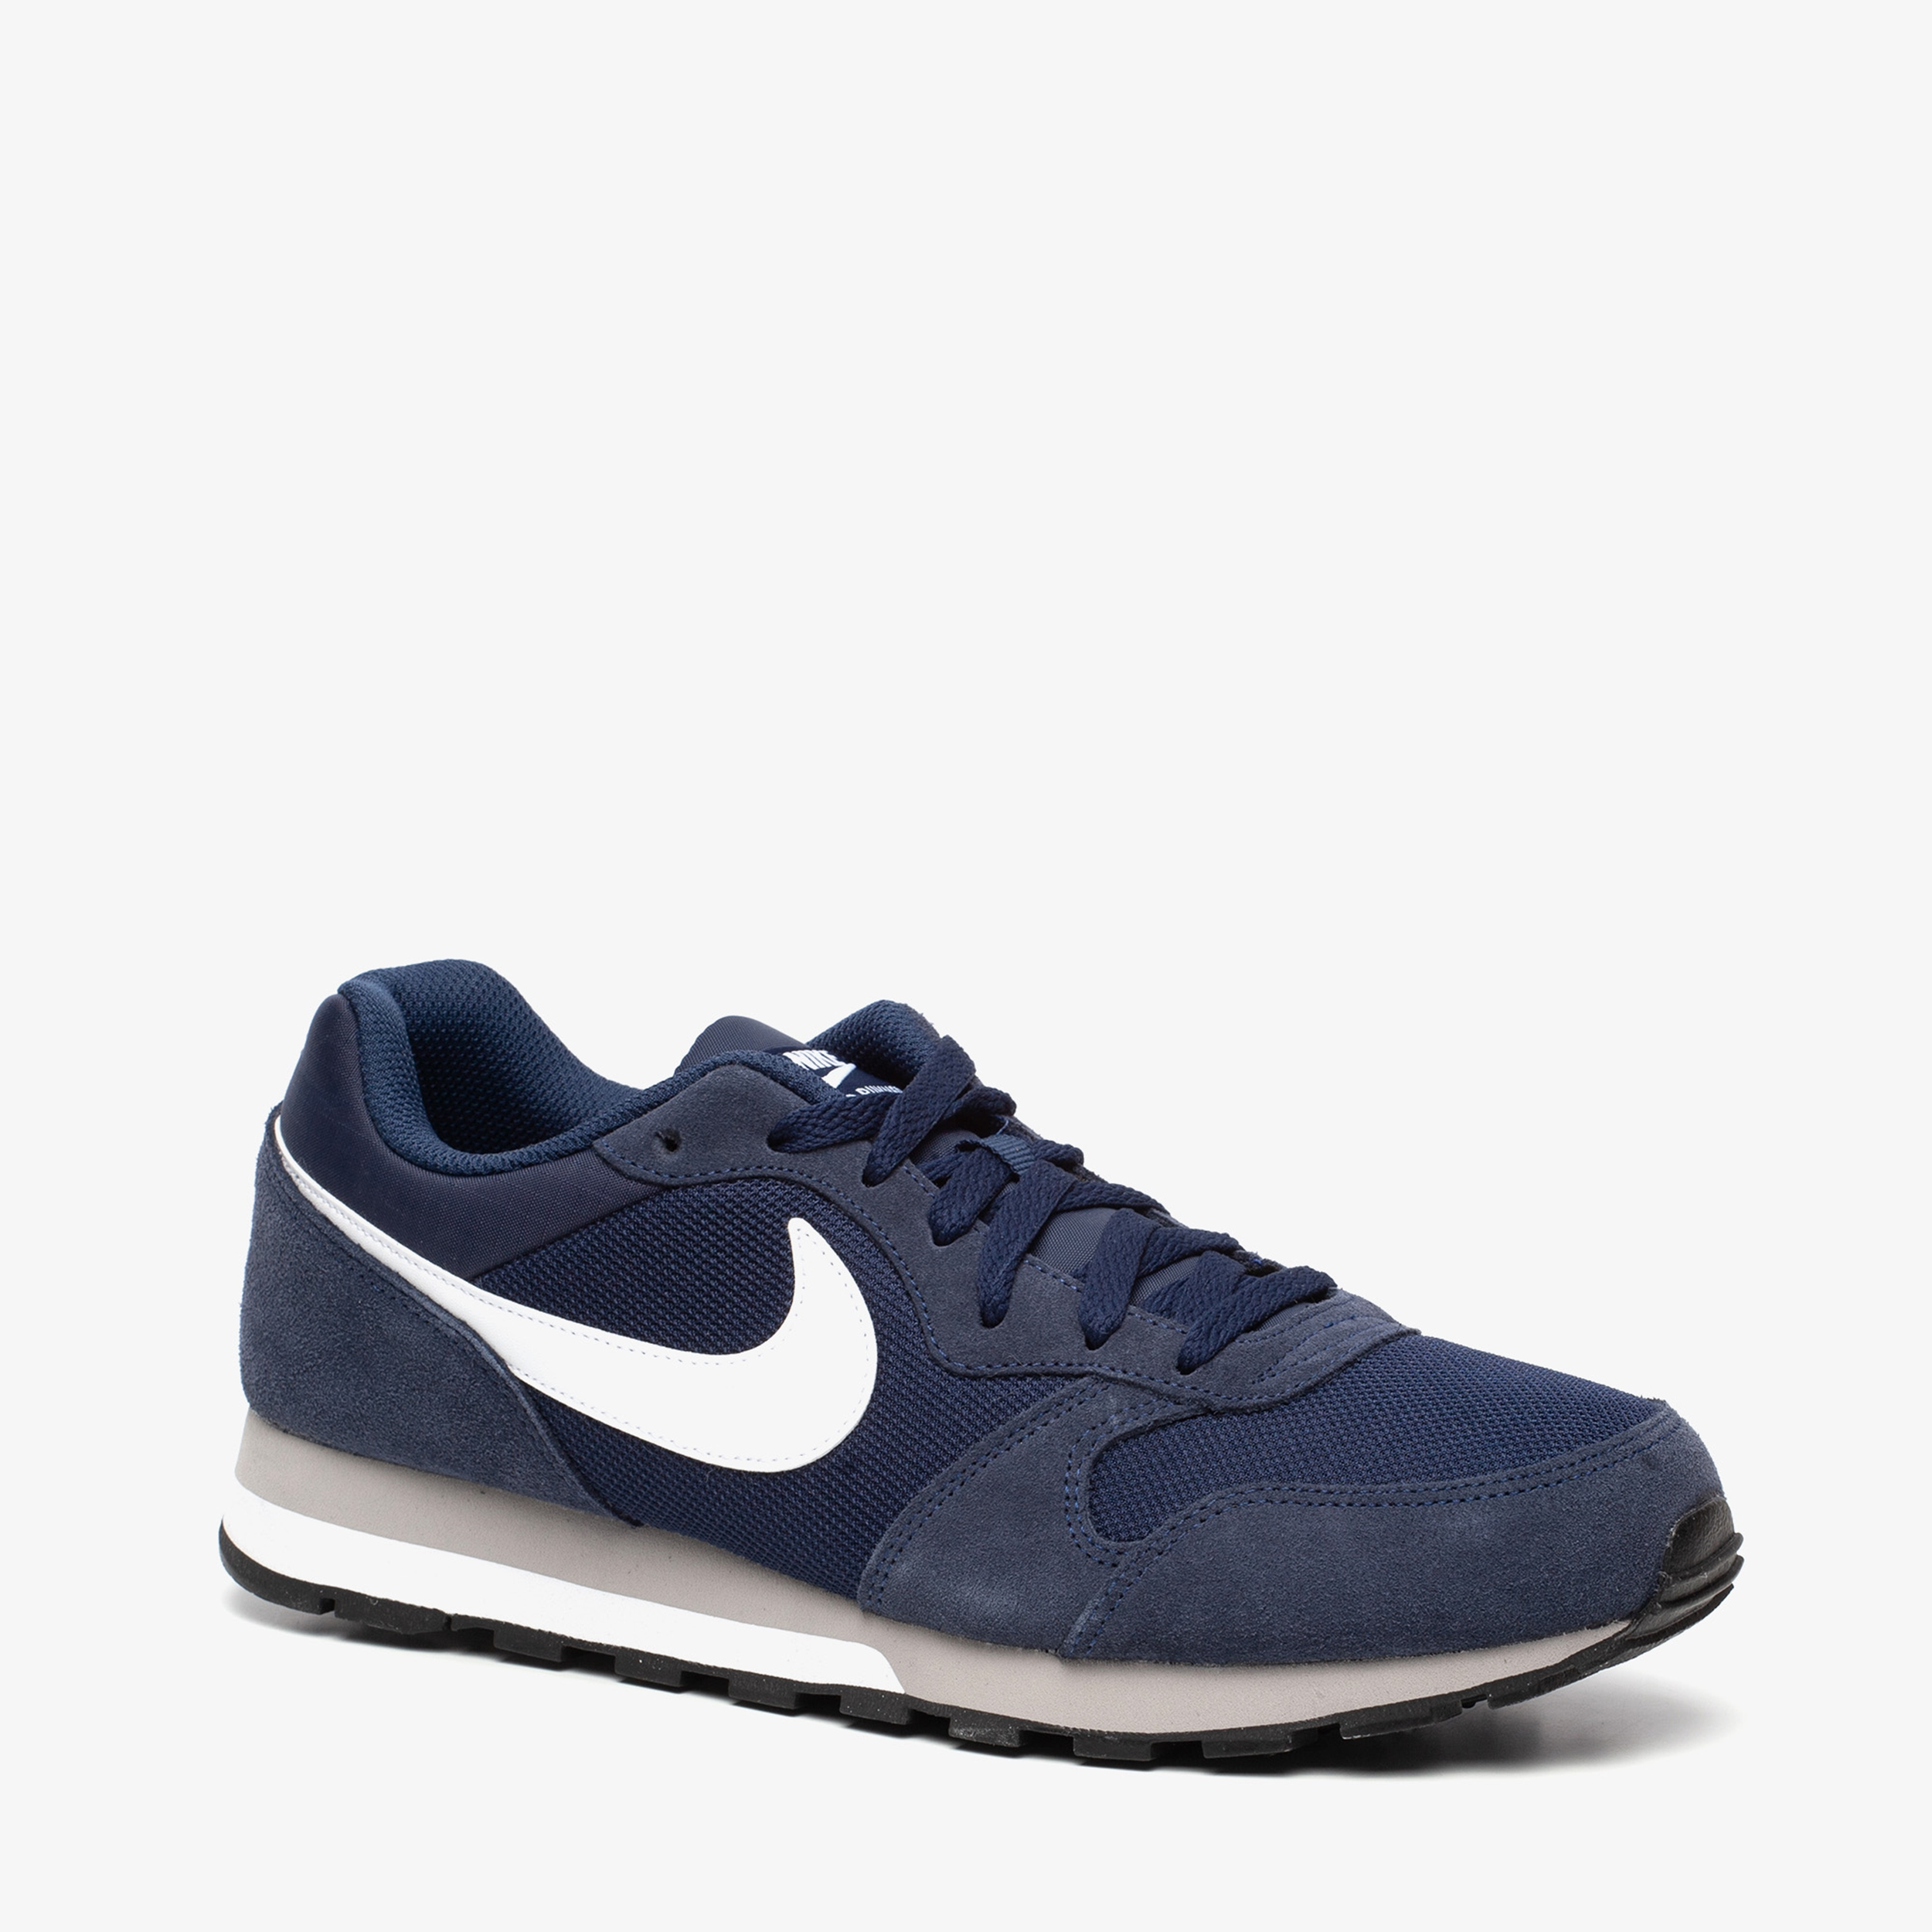 Nike MD Runner 2 heren sneakers | Scapino.nl